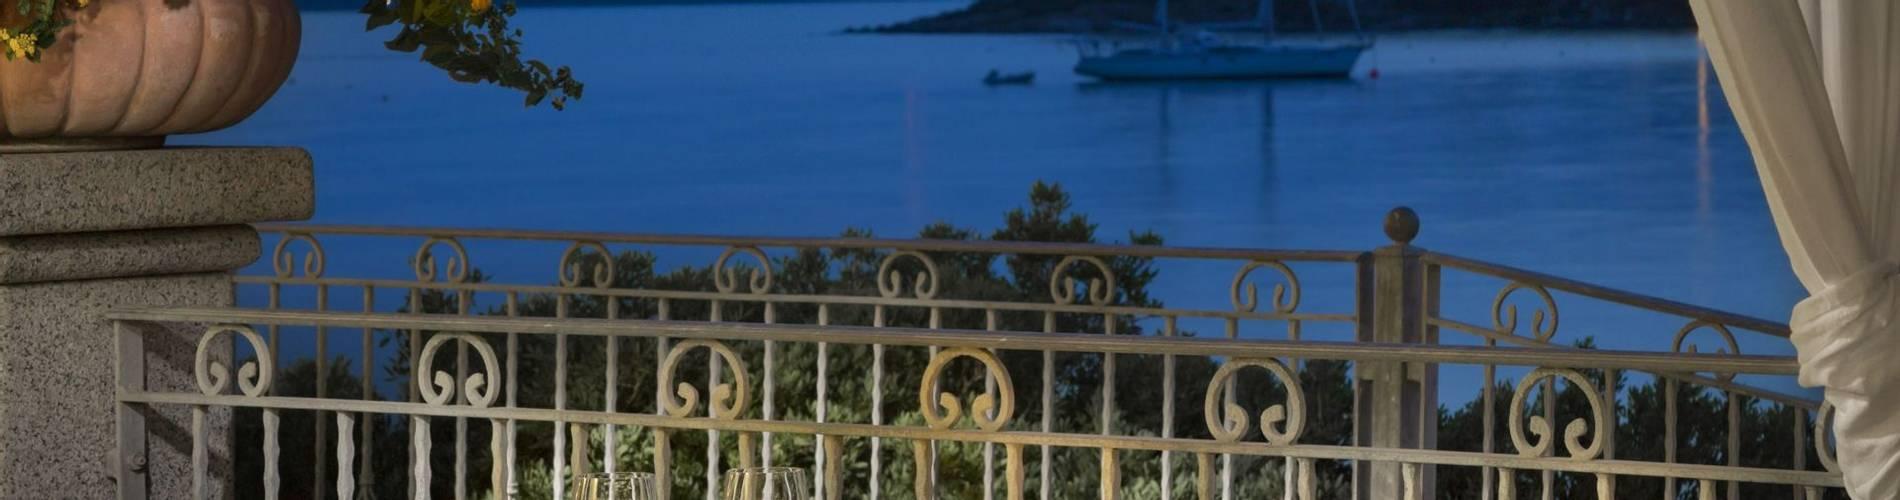 Blú Restaurante Sardegna - terrace 1.jpg